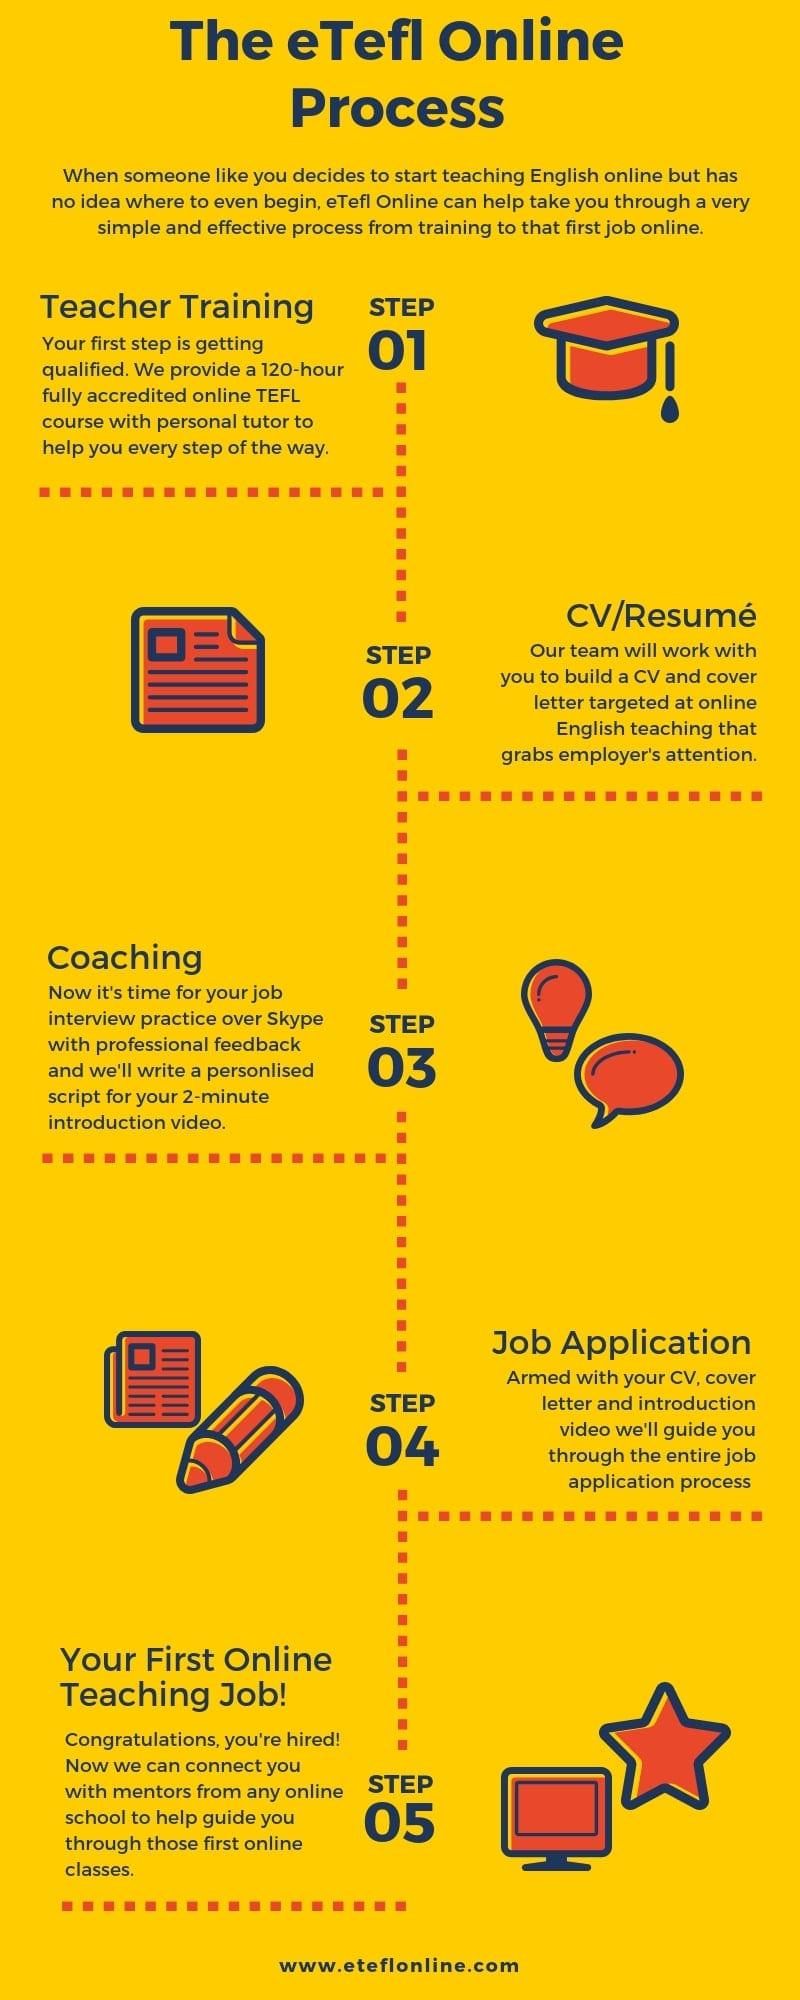 How can eTefl Online help you start Teaching English Online? - eTEFL Online